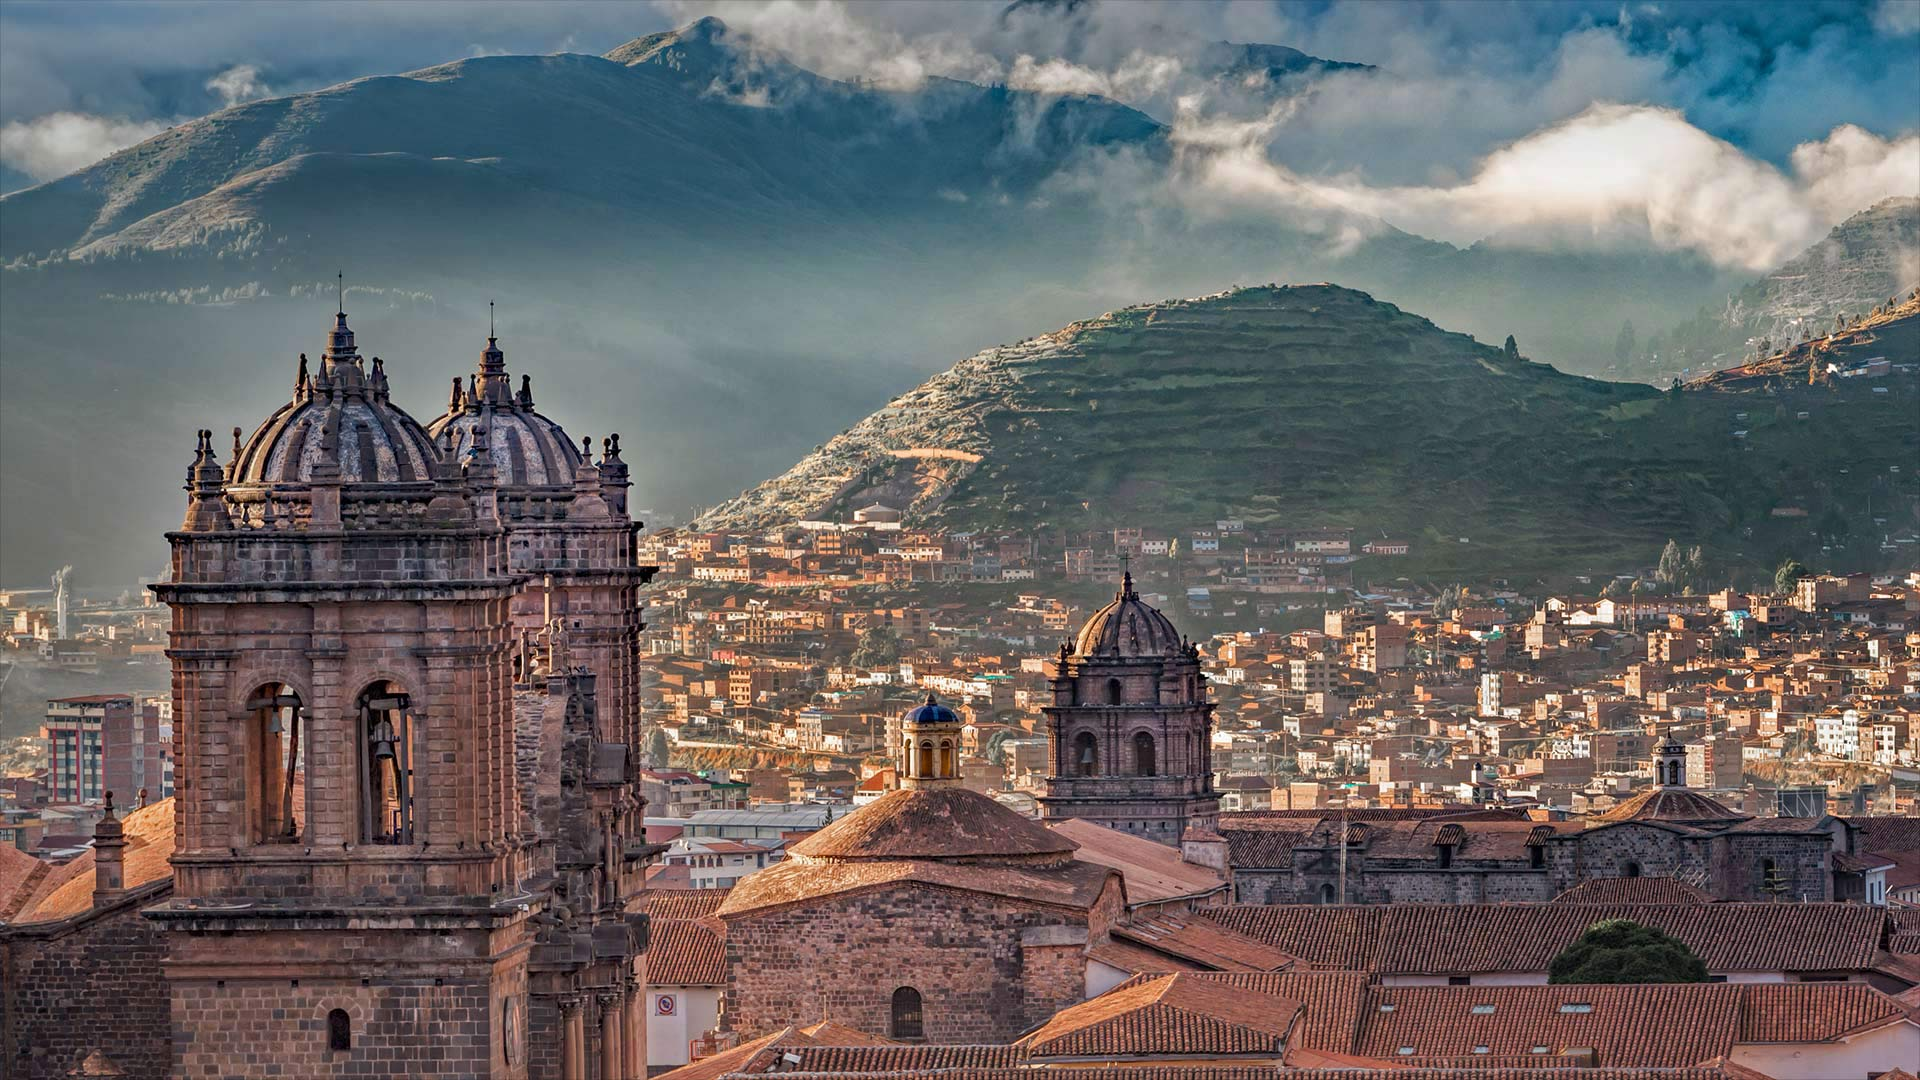 Cusco Cathedral on the Plaza de Armas, Cusco, Peru (© sharptoyou/Shutterstock)